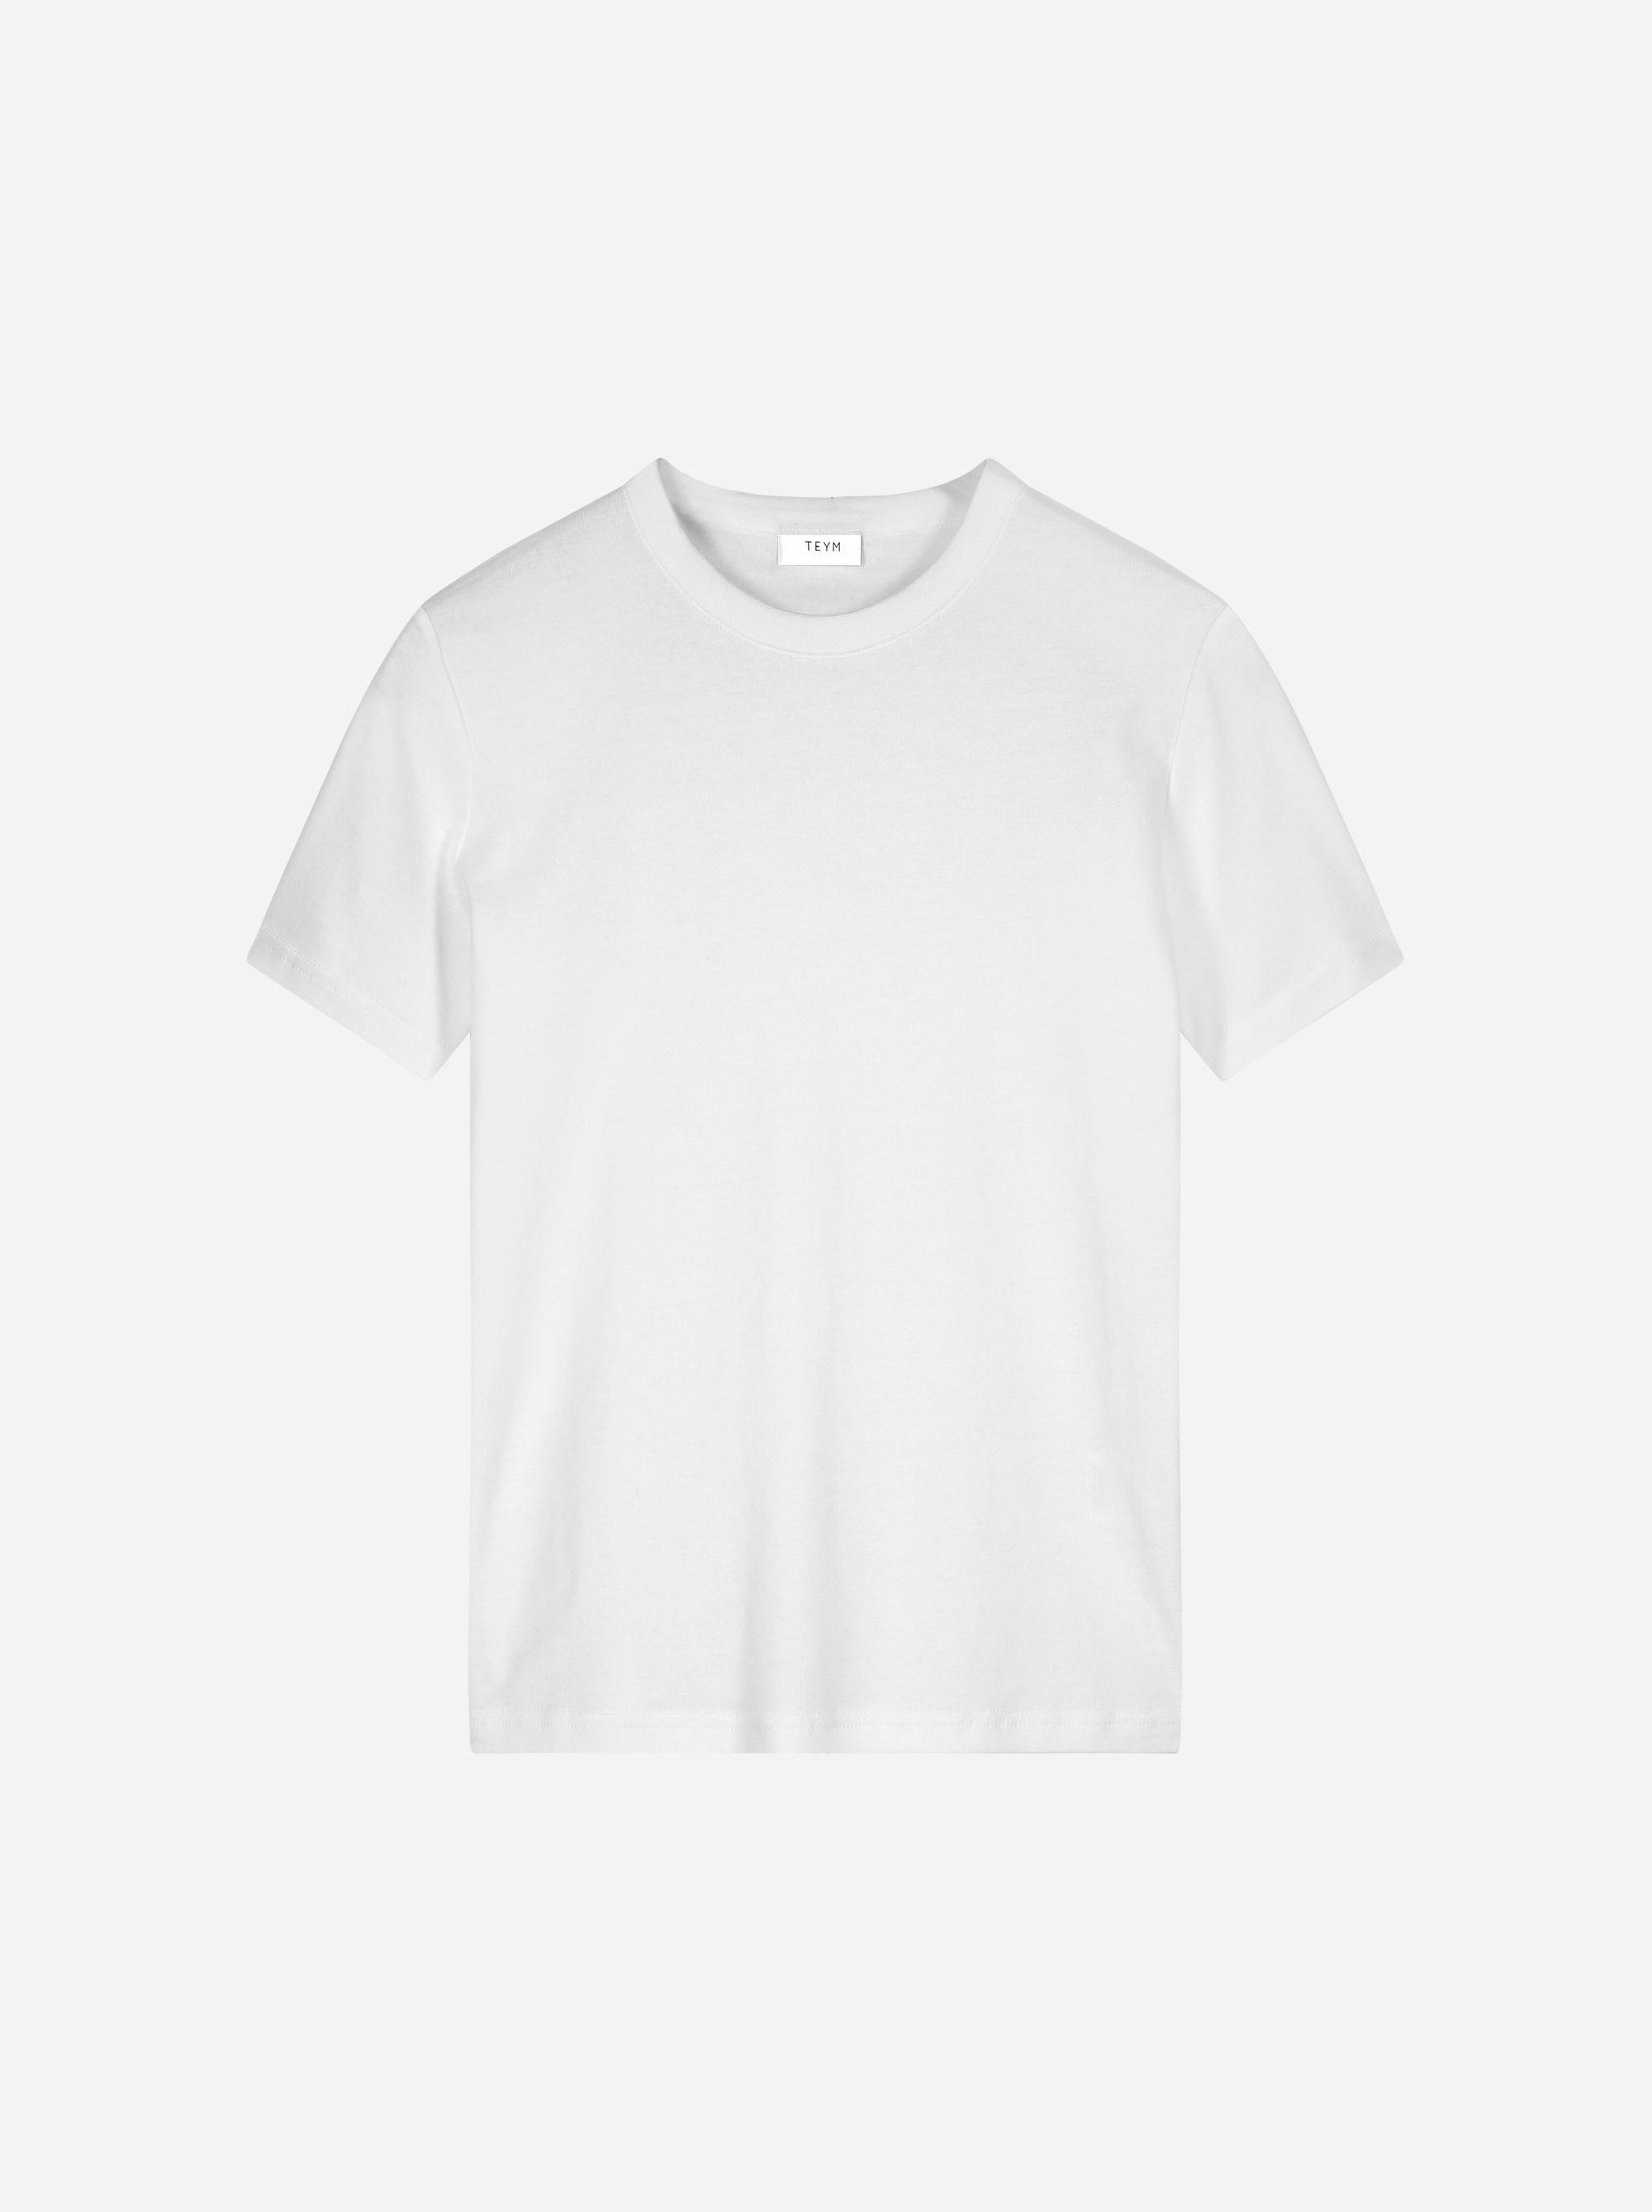 Teym_The T-Shirt_white_female_front_1B